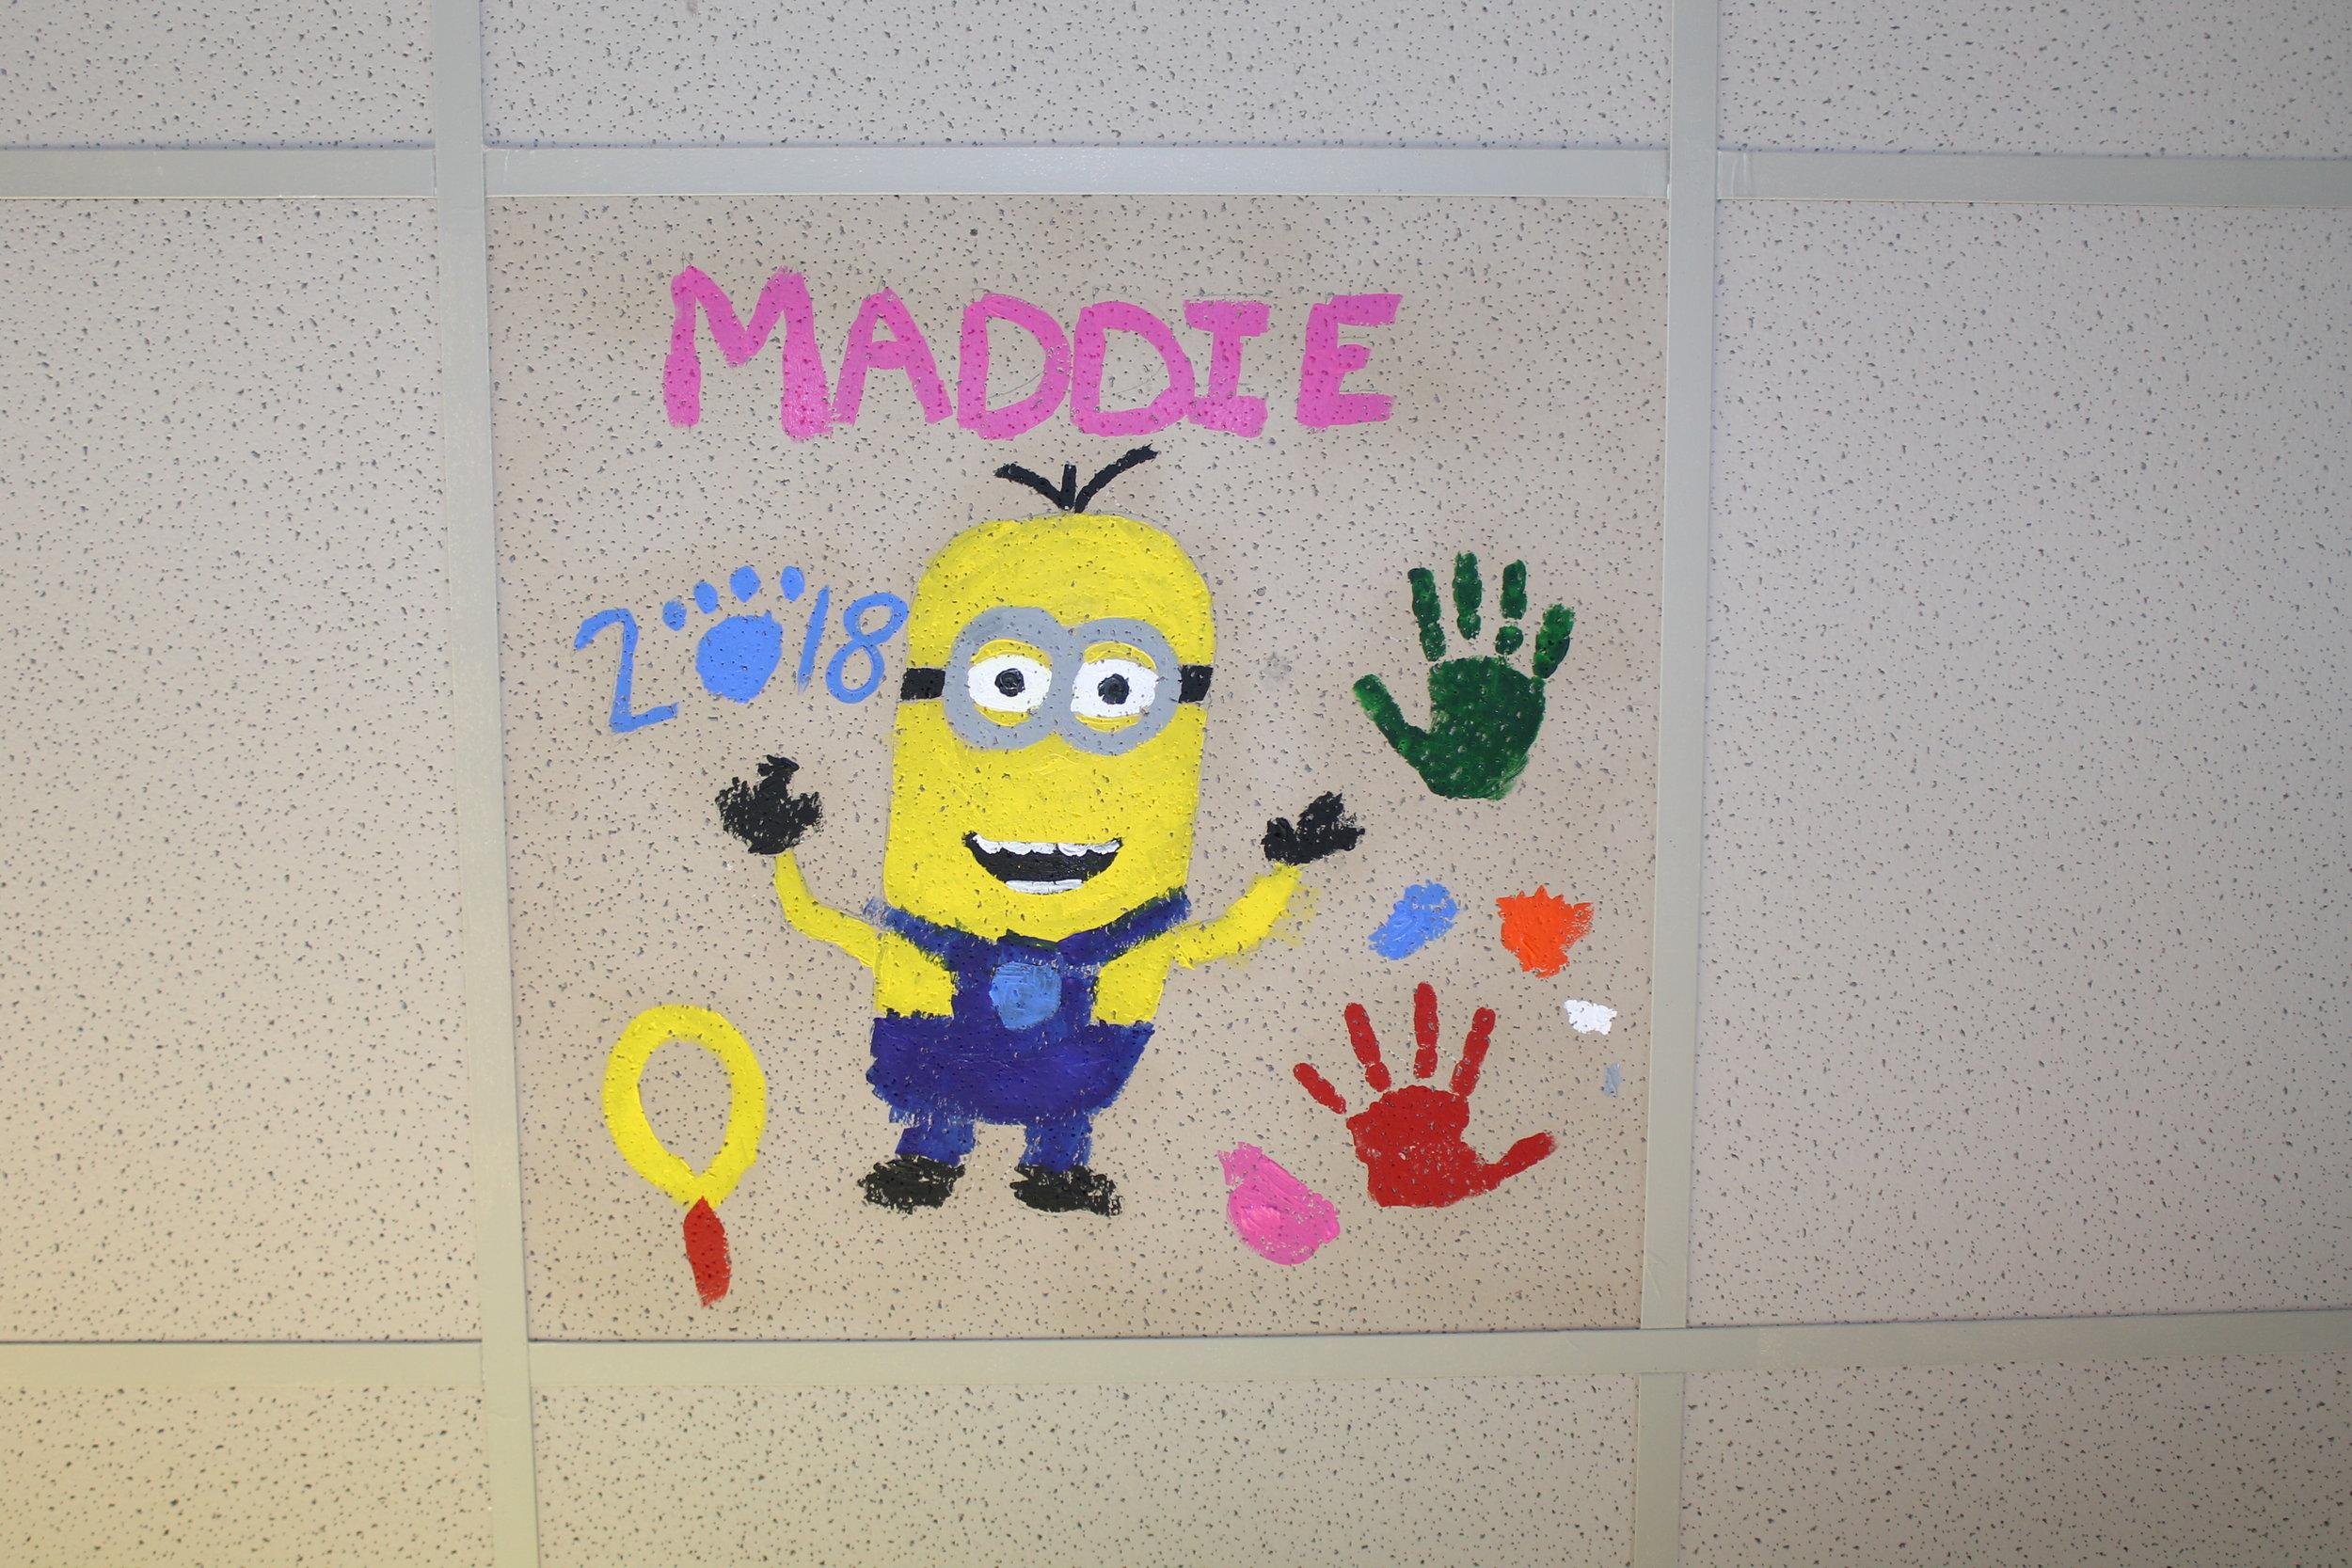 Maddie's final tile artwork